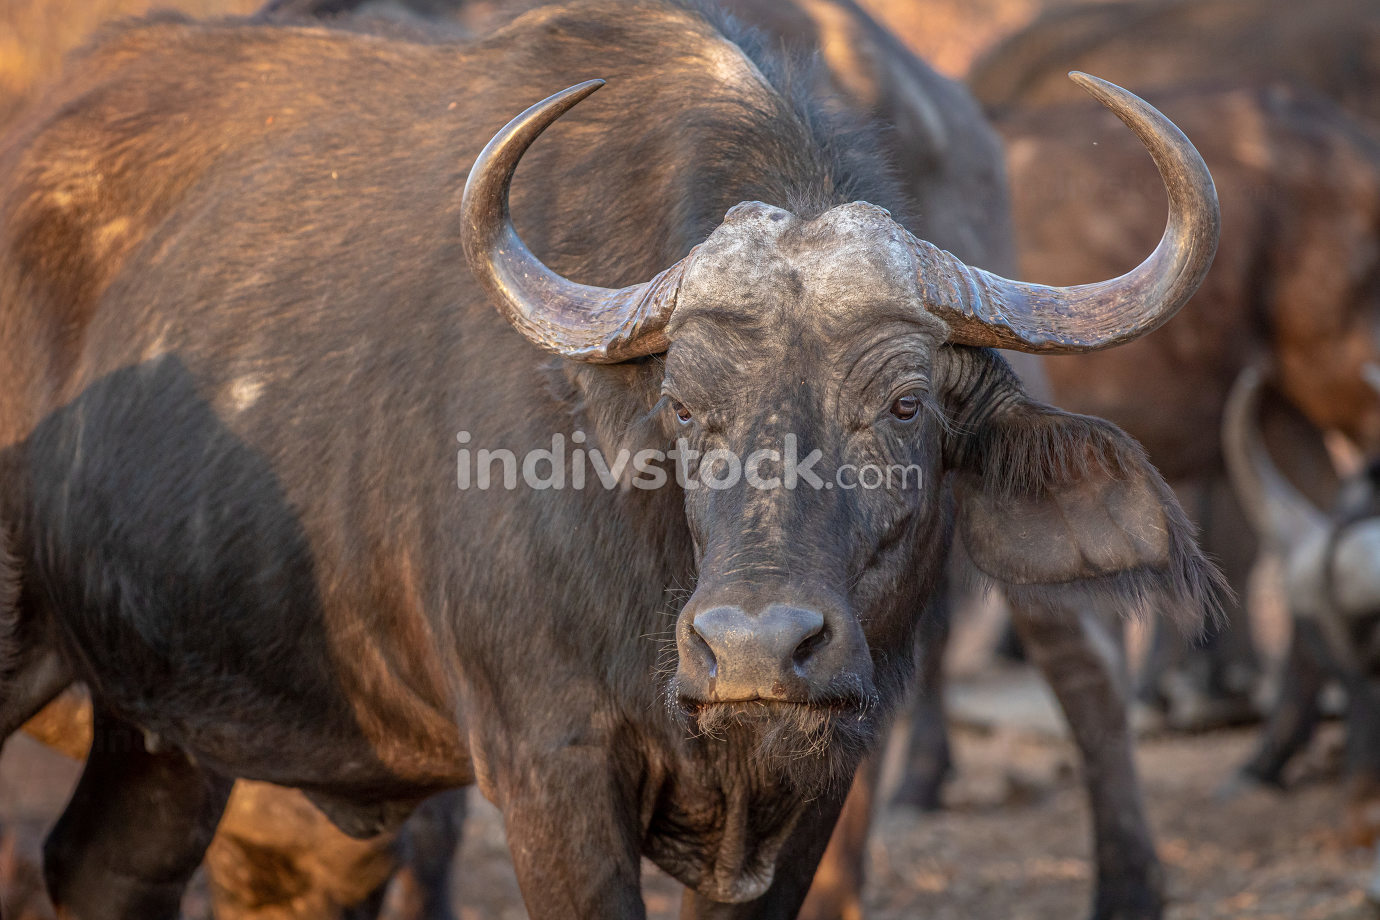 African buffalo starring at the camera.